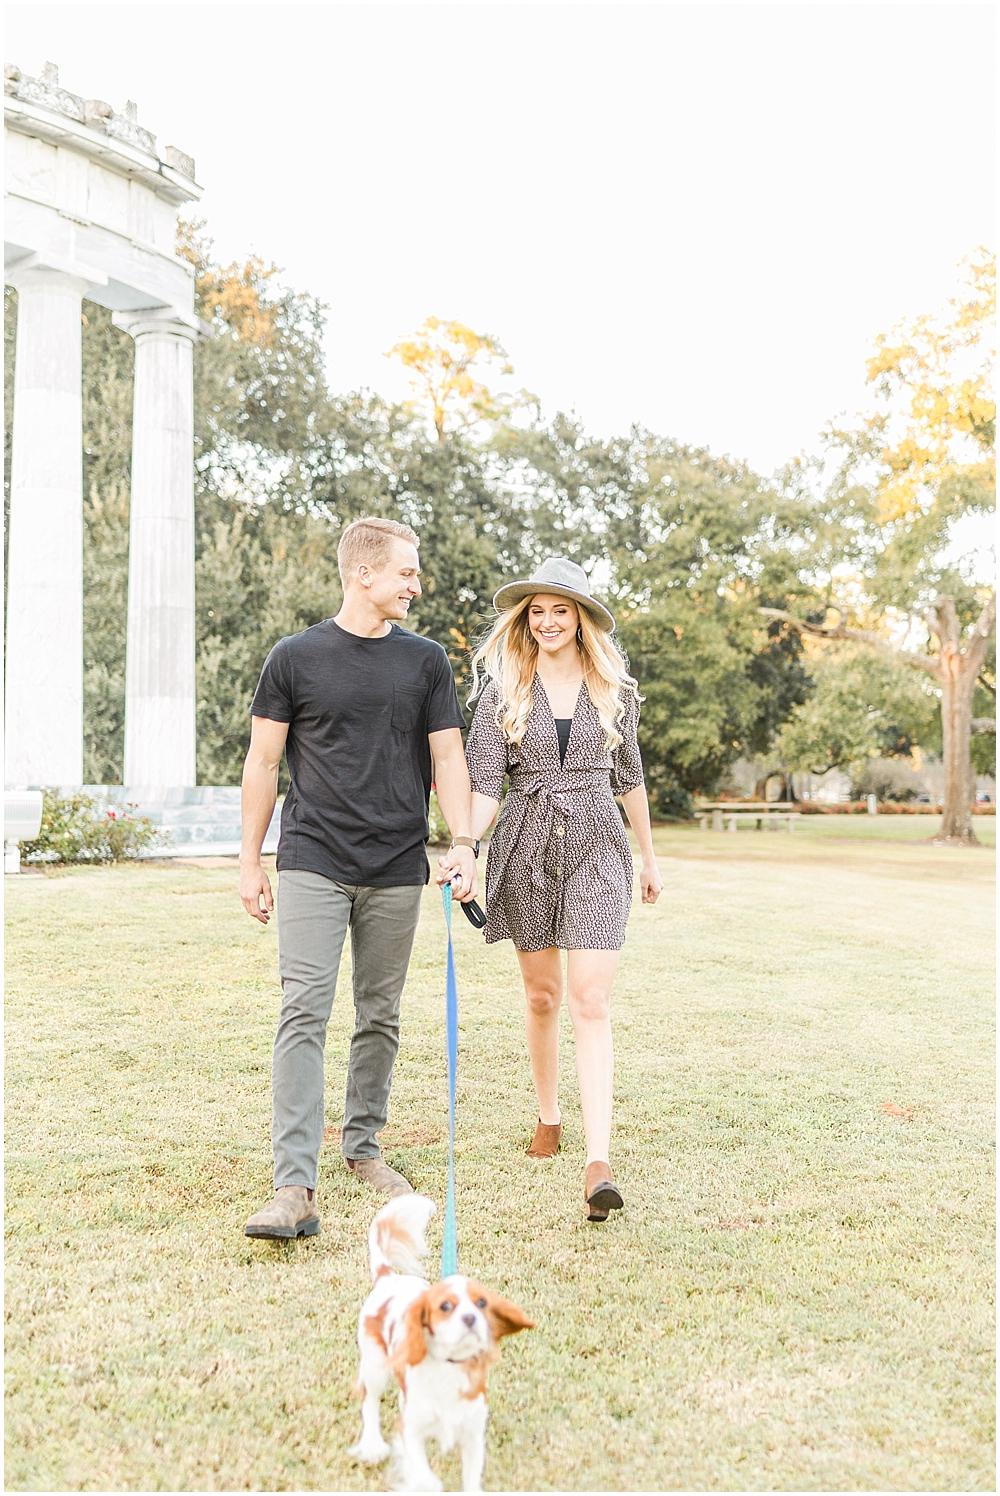 Ashton-Clark-Photography-Wedding-Portrait-Family-Photographer-Mobile-Alabama_0149.jpg